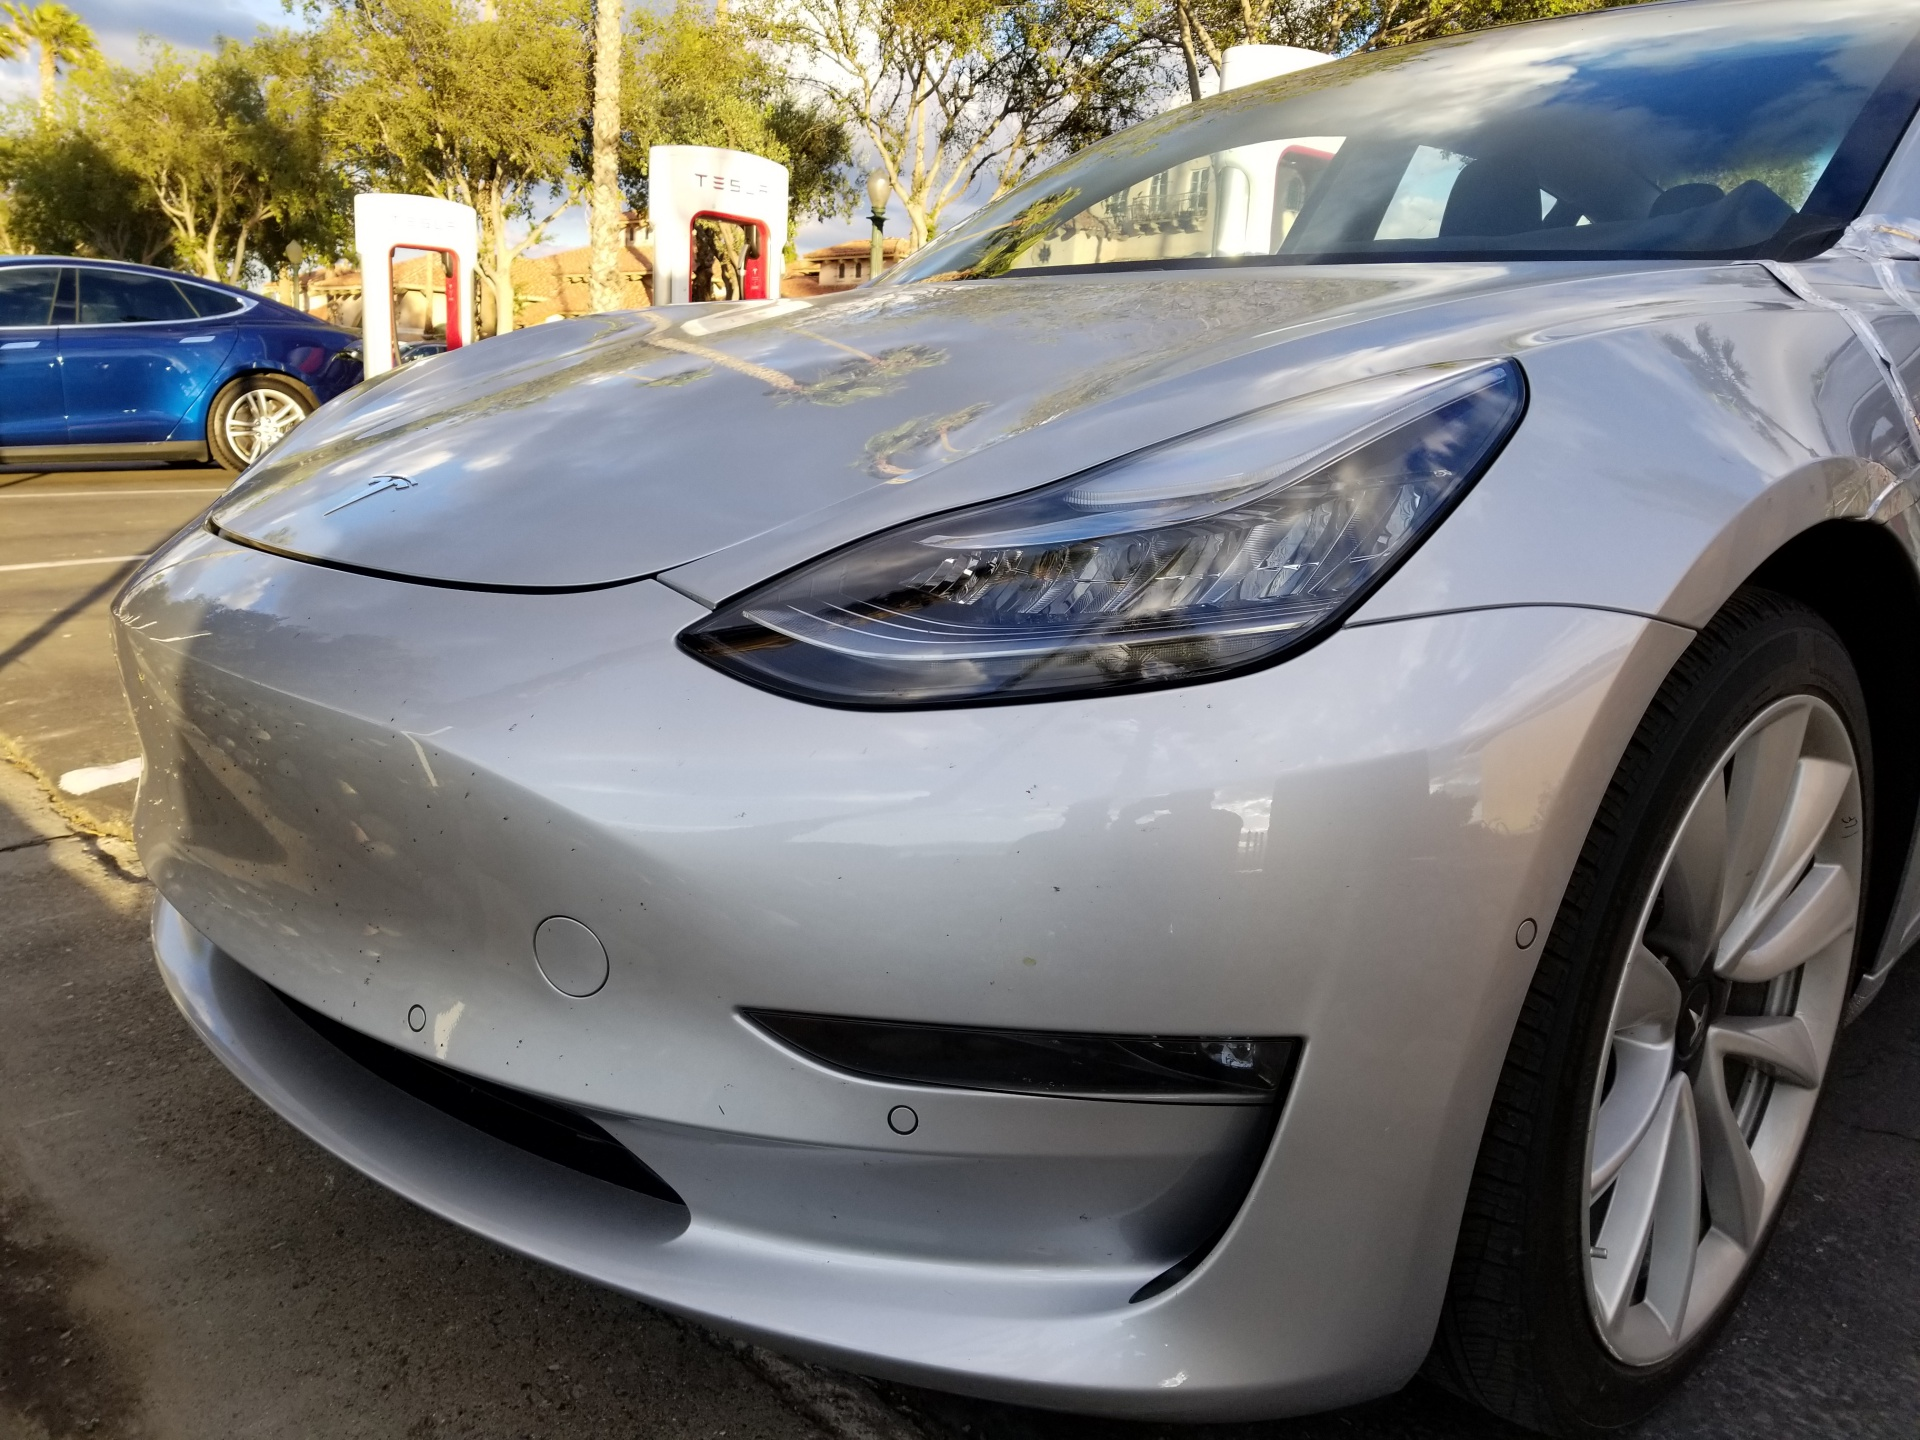 Tesla Model 3 Production Two Weeks Ahead Of Schedule